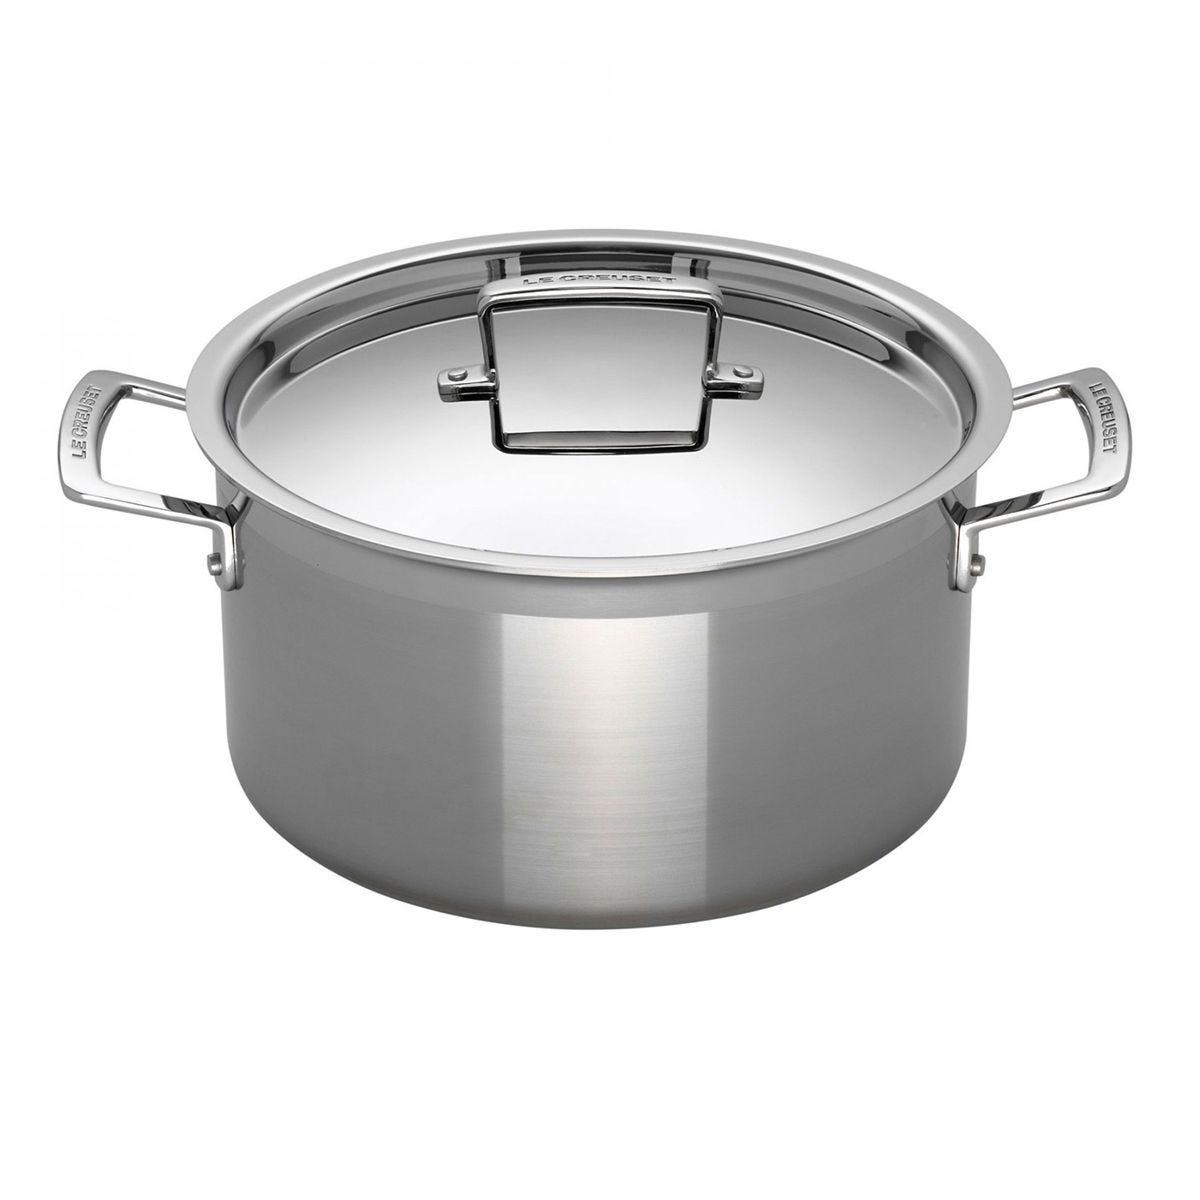 Le Creuset 3-Ply Stainless Steel Deep Casserole 24cm